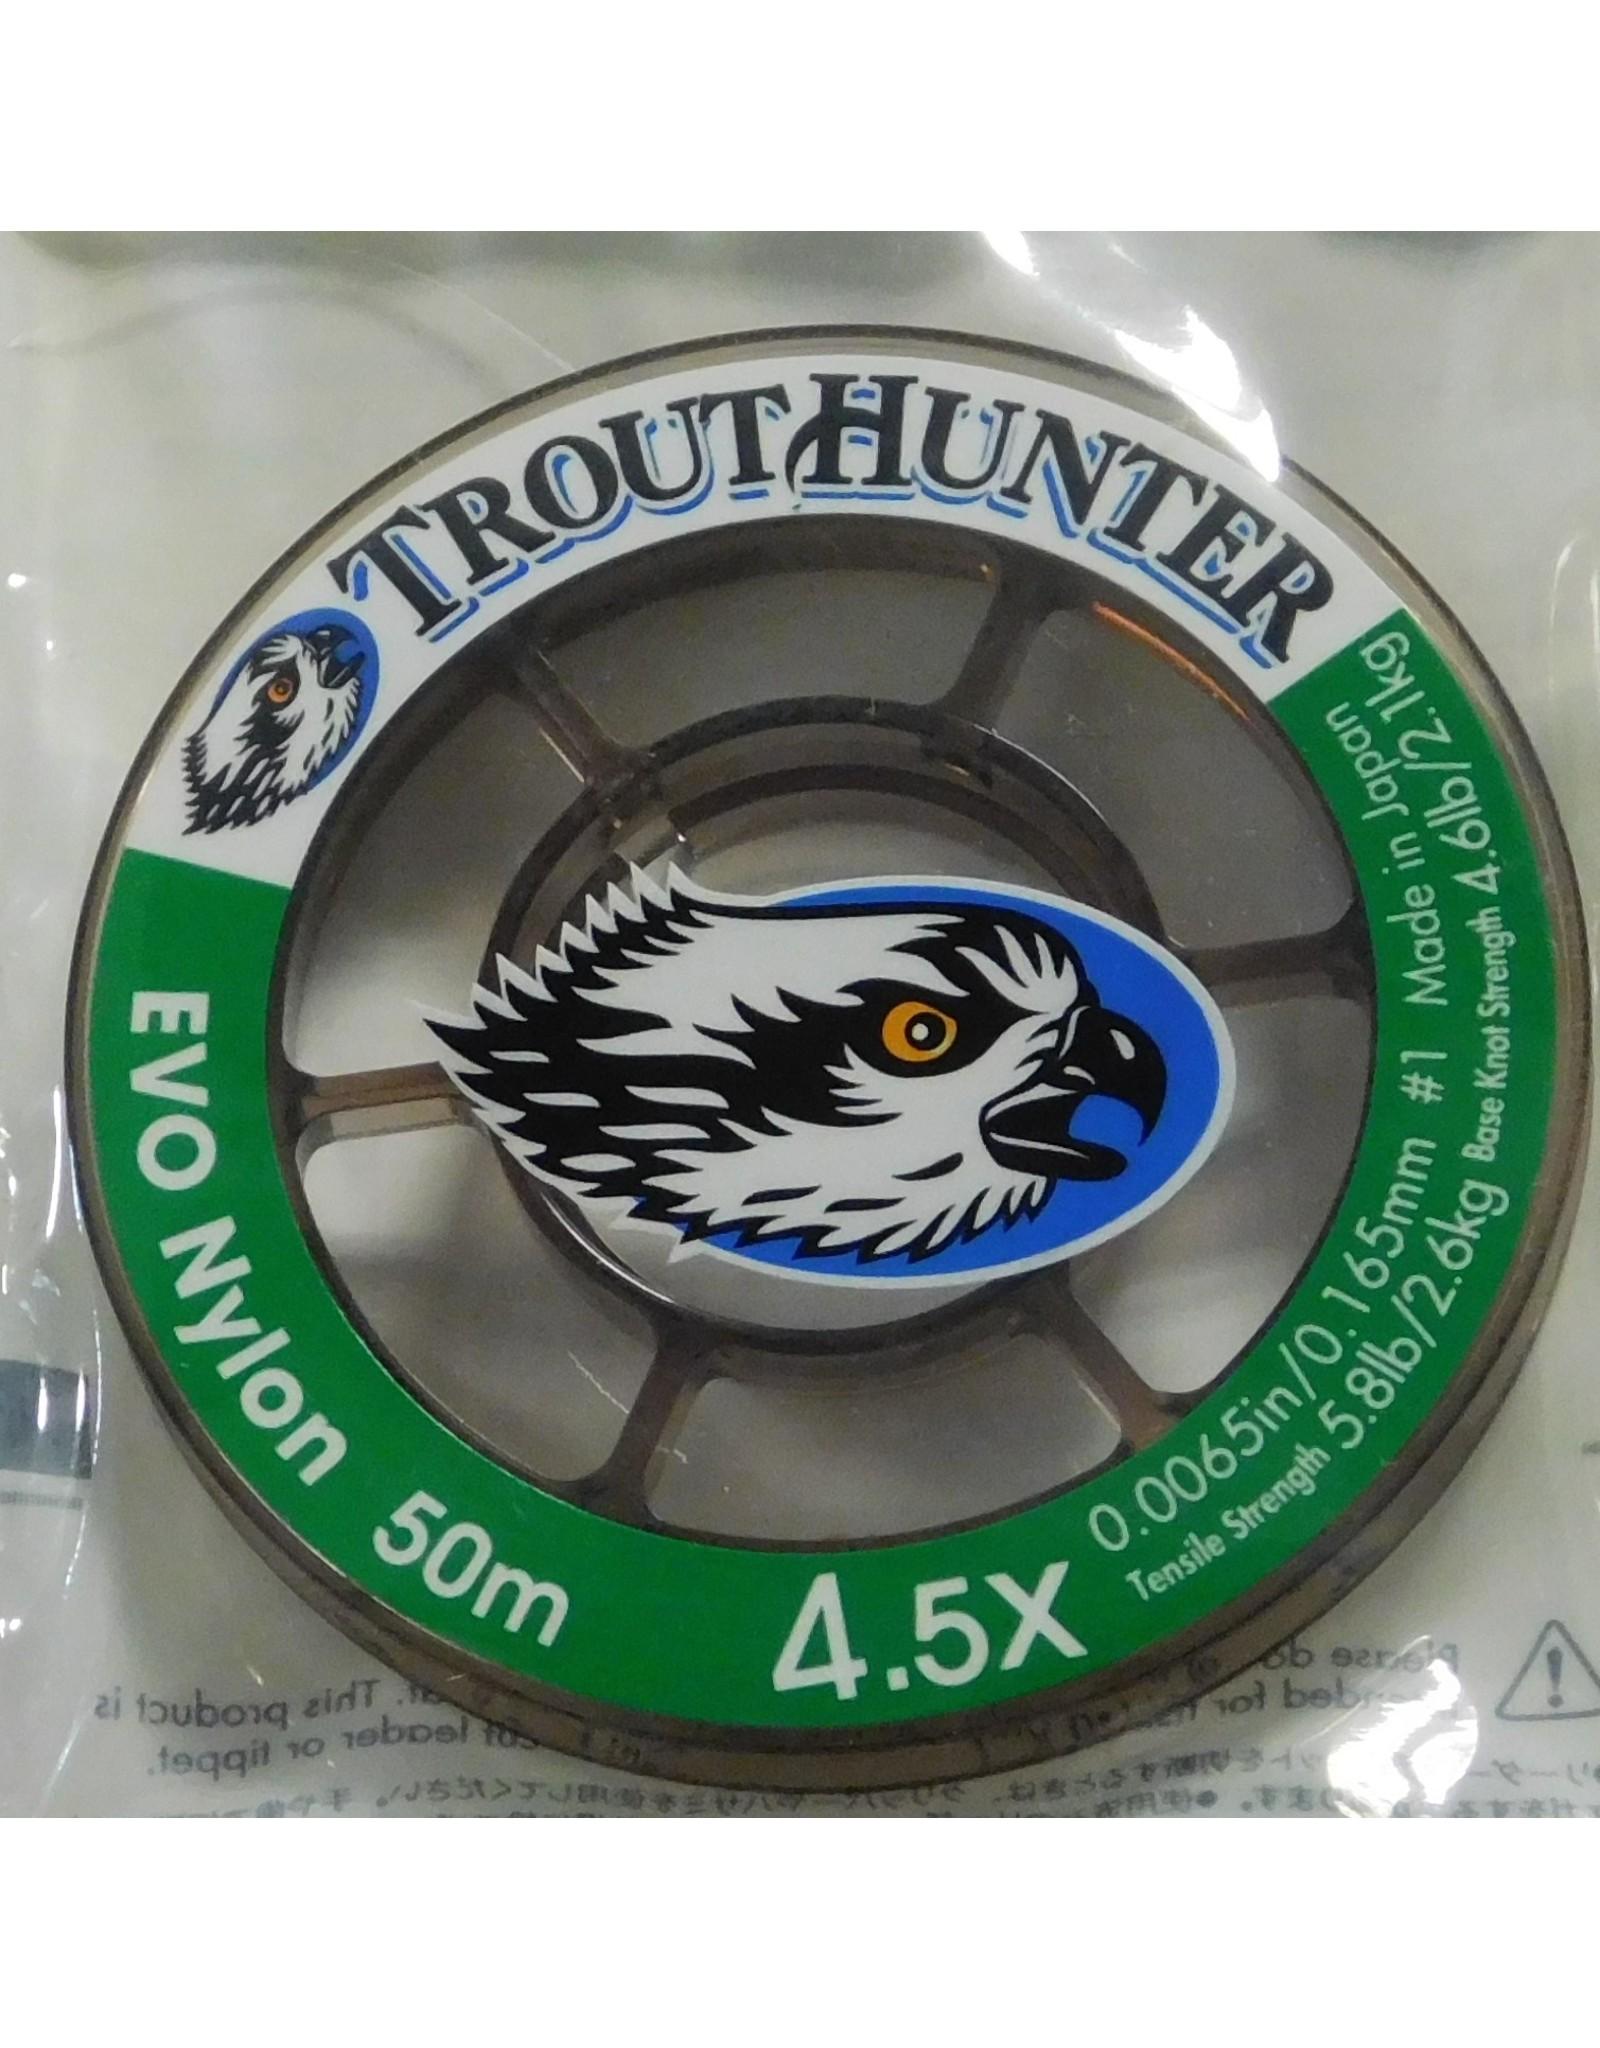 Trouthunter TroutHunter EVO Nylon Tippet 4.5X 50m